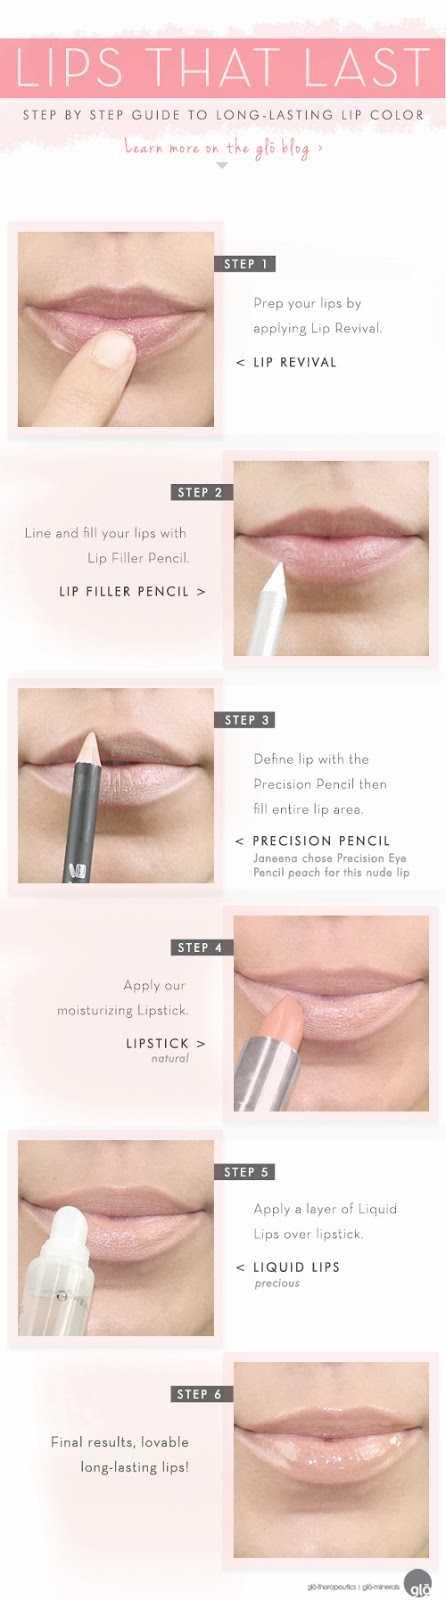 Lips That Last